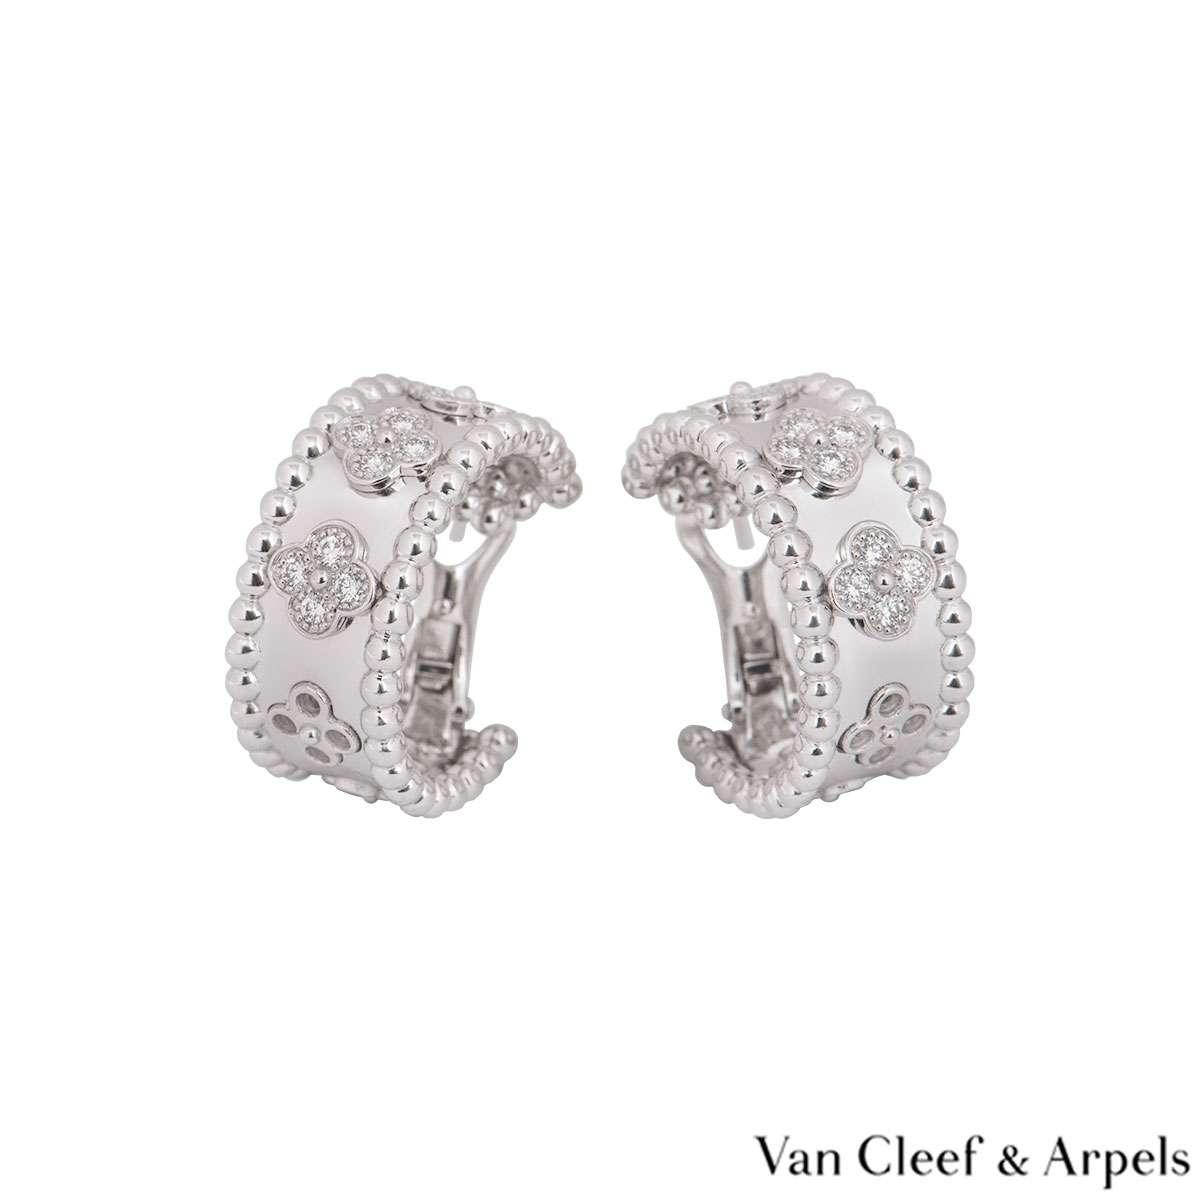 Van Cleef & Arpels White Gold Perlée Clovers Earrings VCARO2ML00